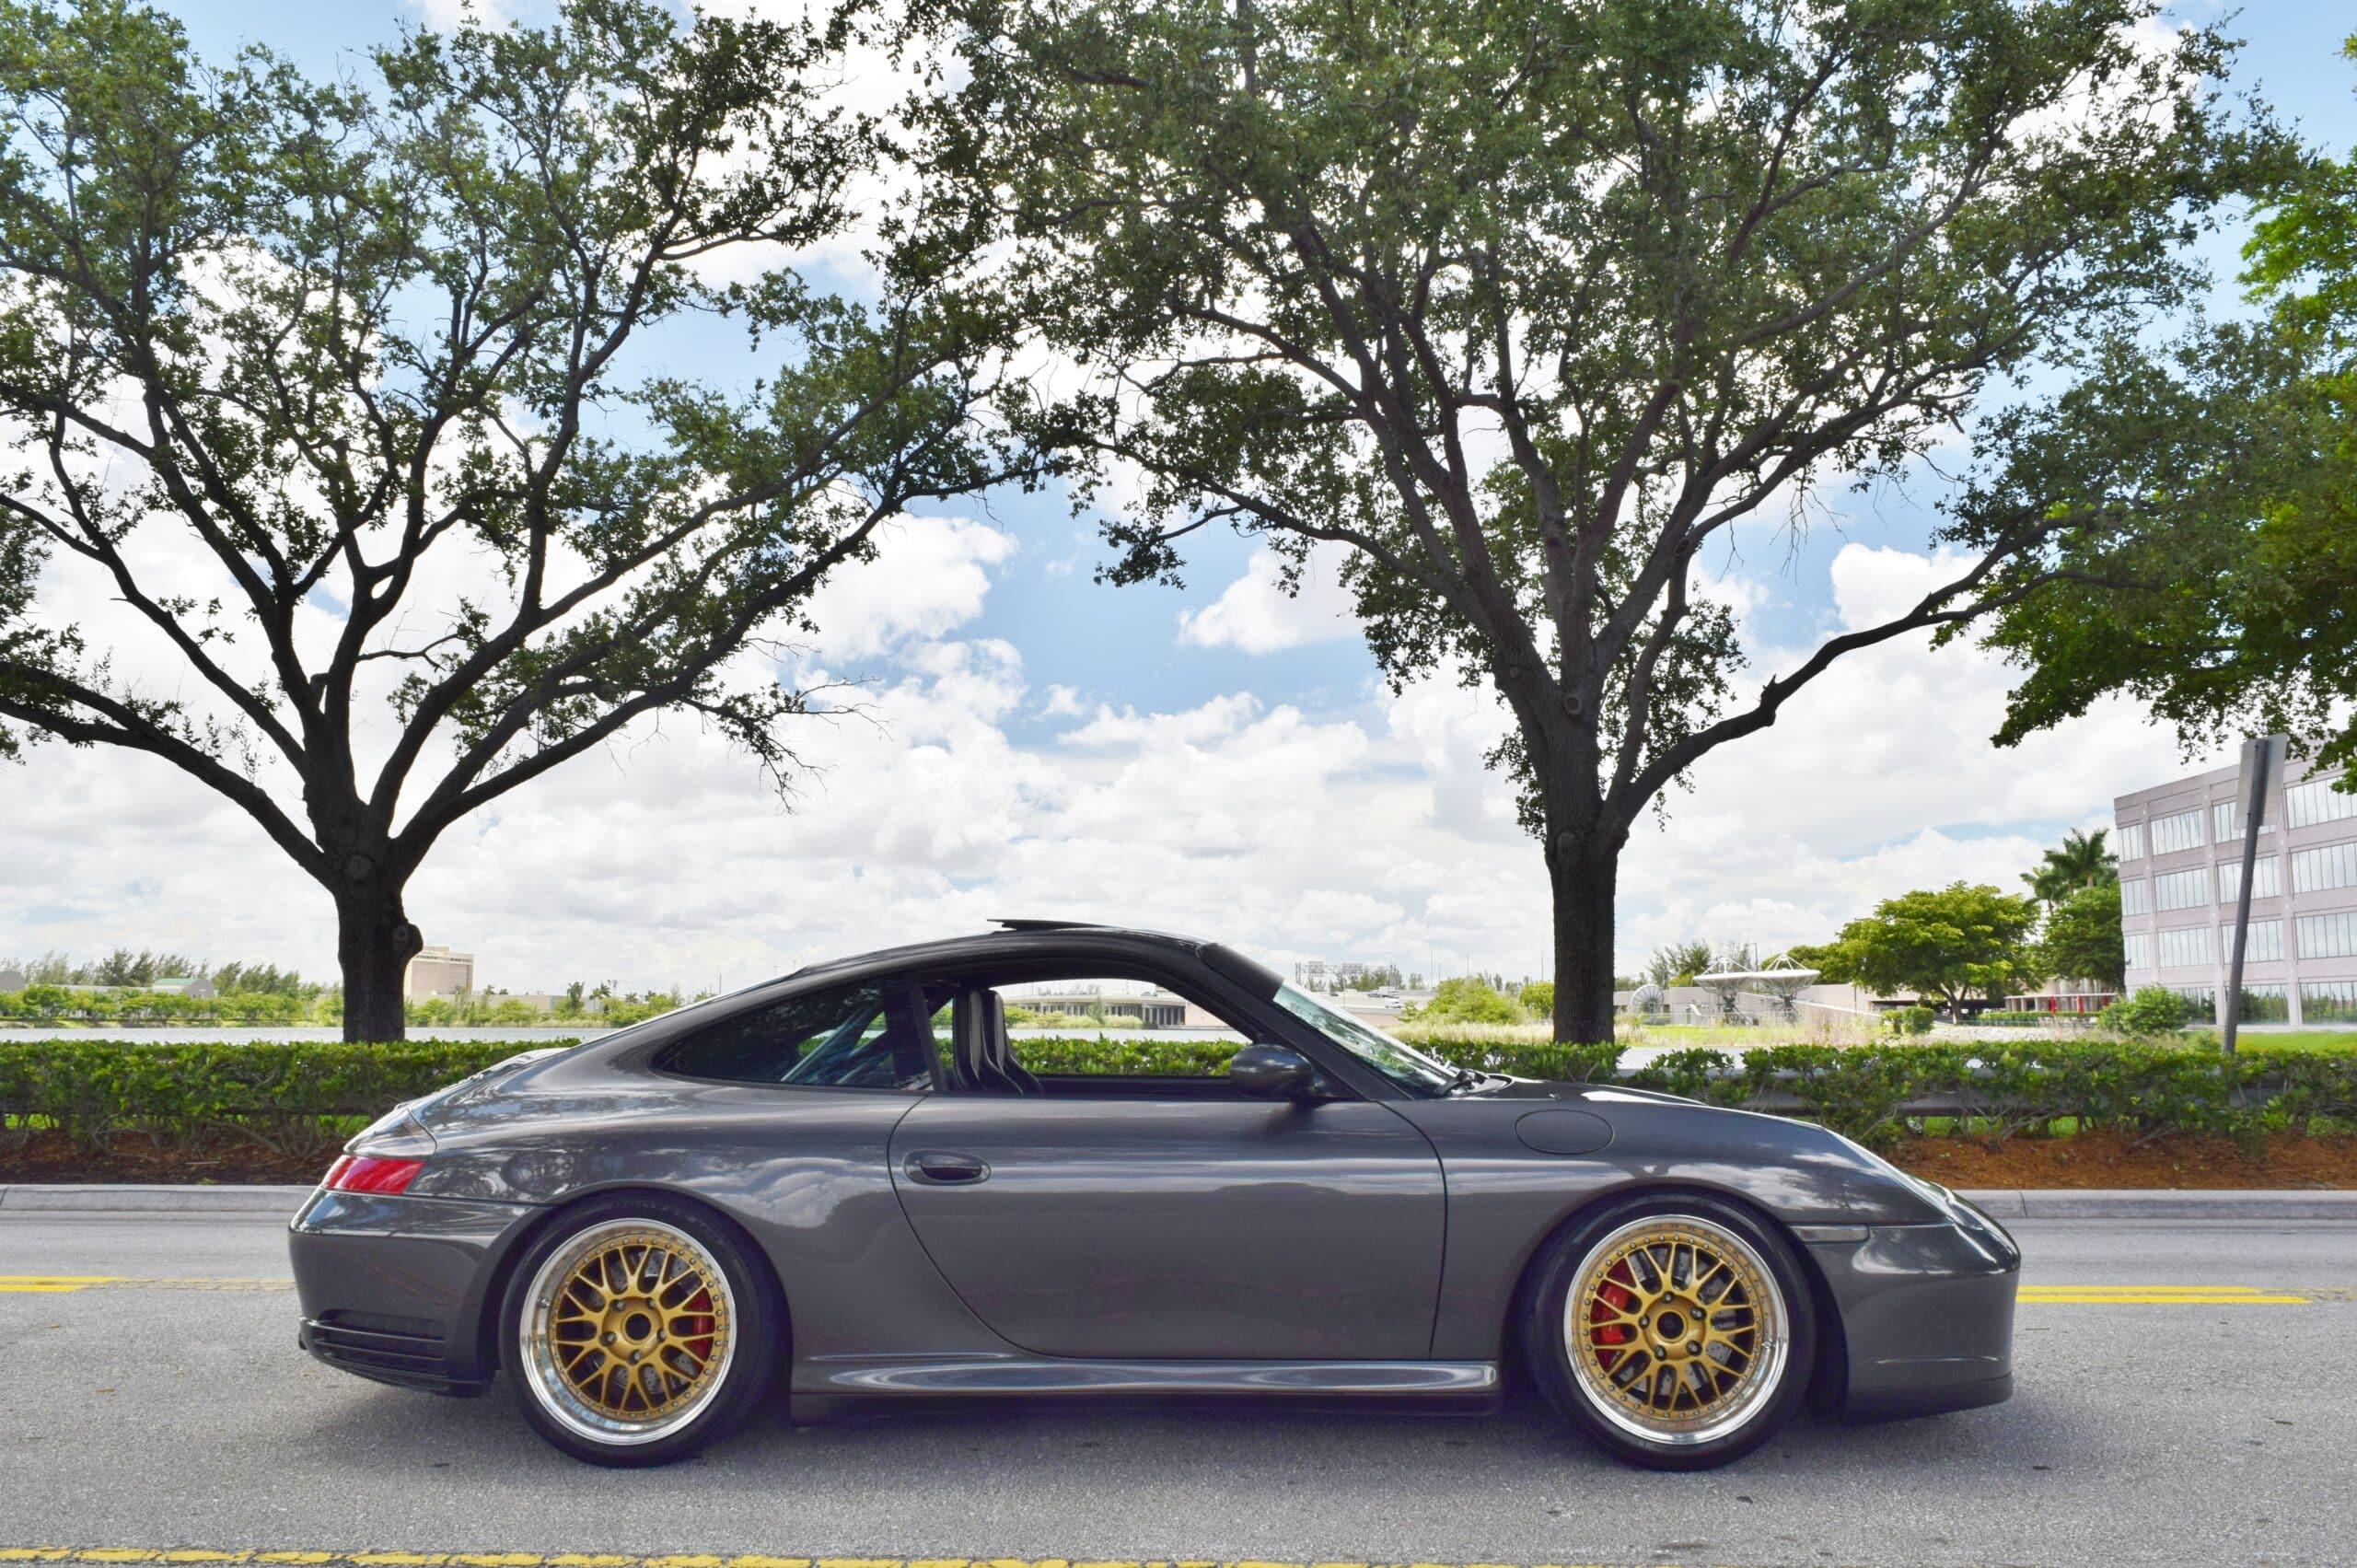 2002 Porsche 911 996 C4S Widebody Show Car- 6 Speed manual -IMS Bearing-Coilovers-Recaro Seats-100% Original Paint